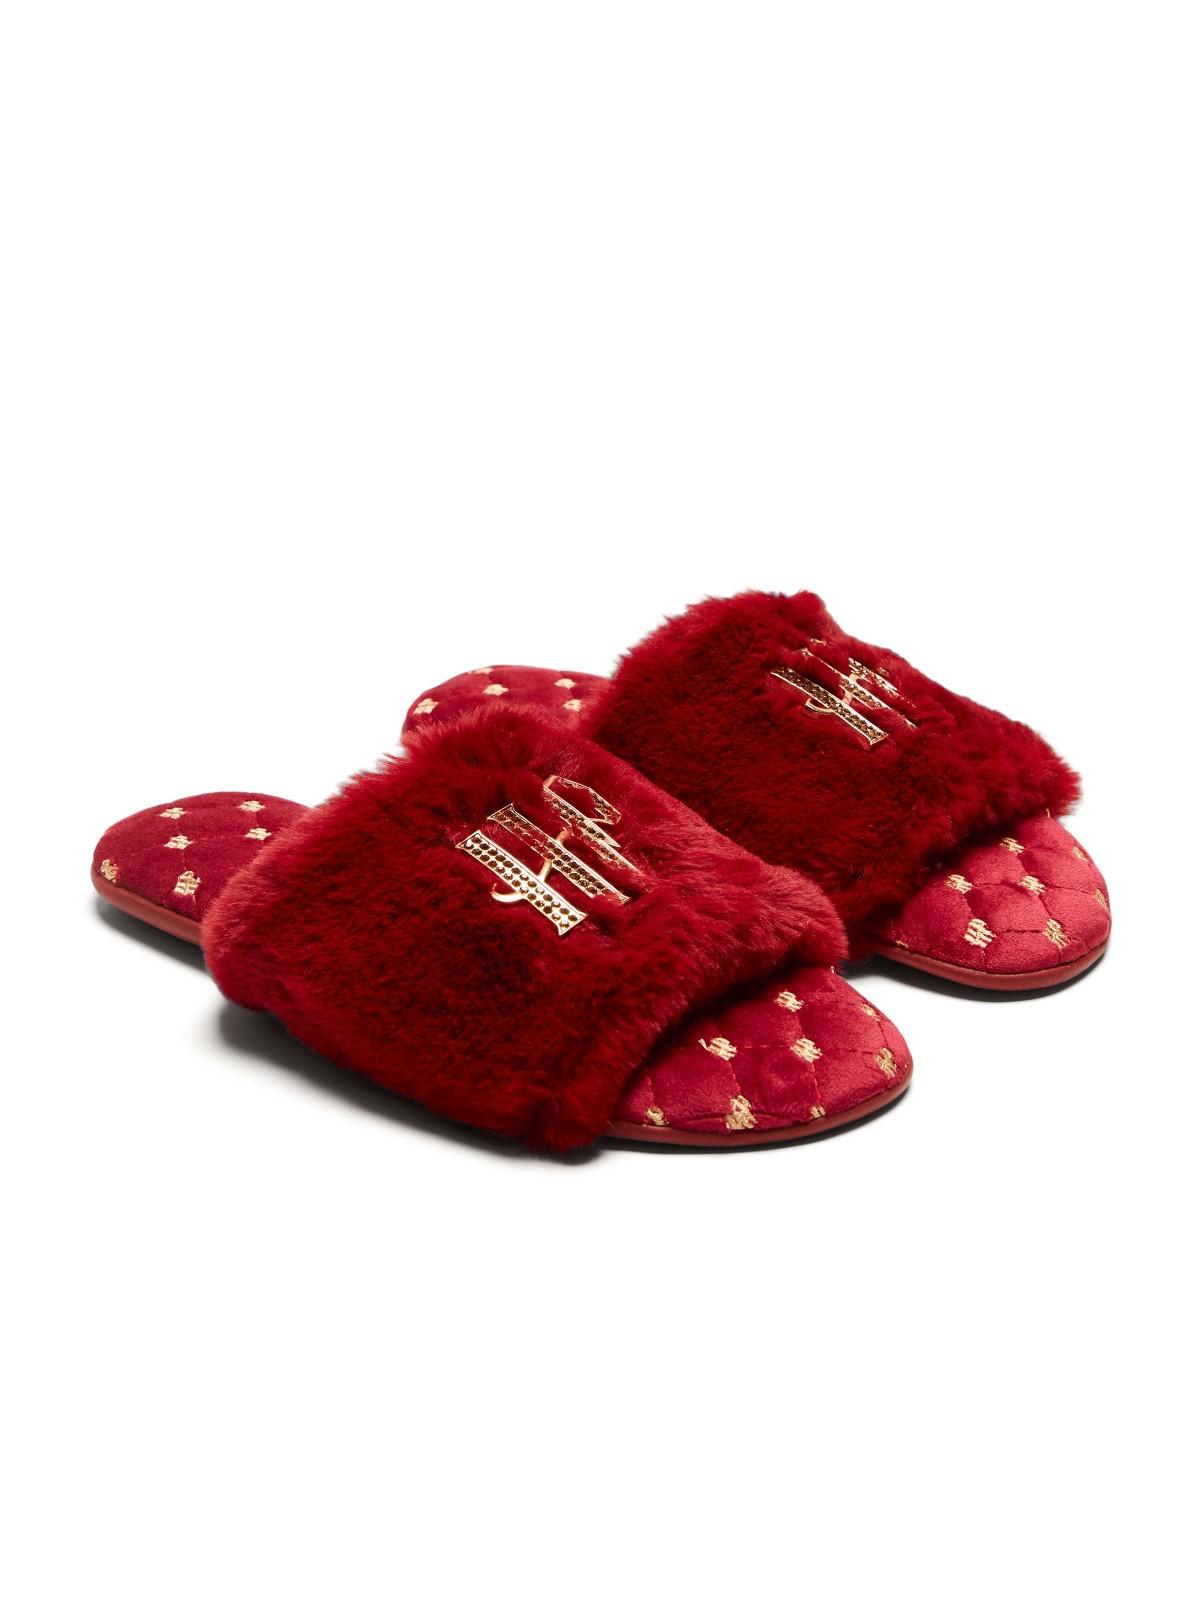 Peter Alexander slippers